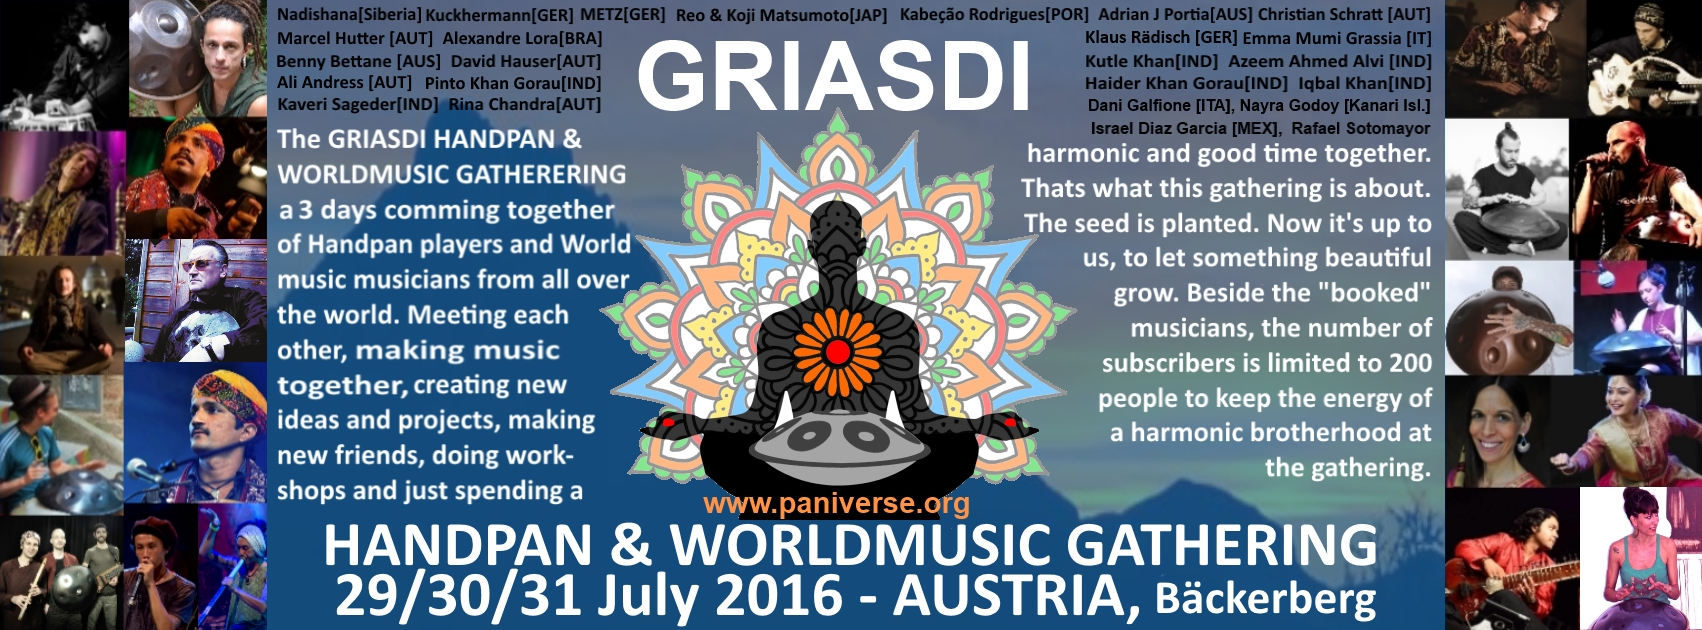 final-GRIASDI_GATHERING2016-1702x630